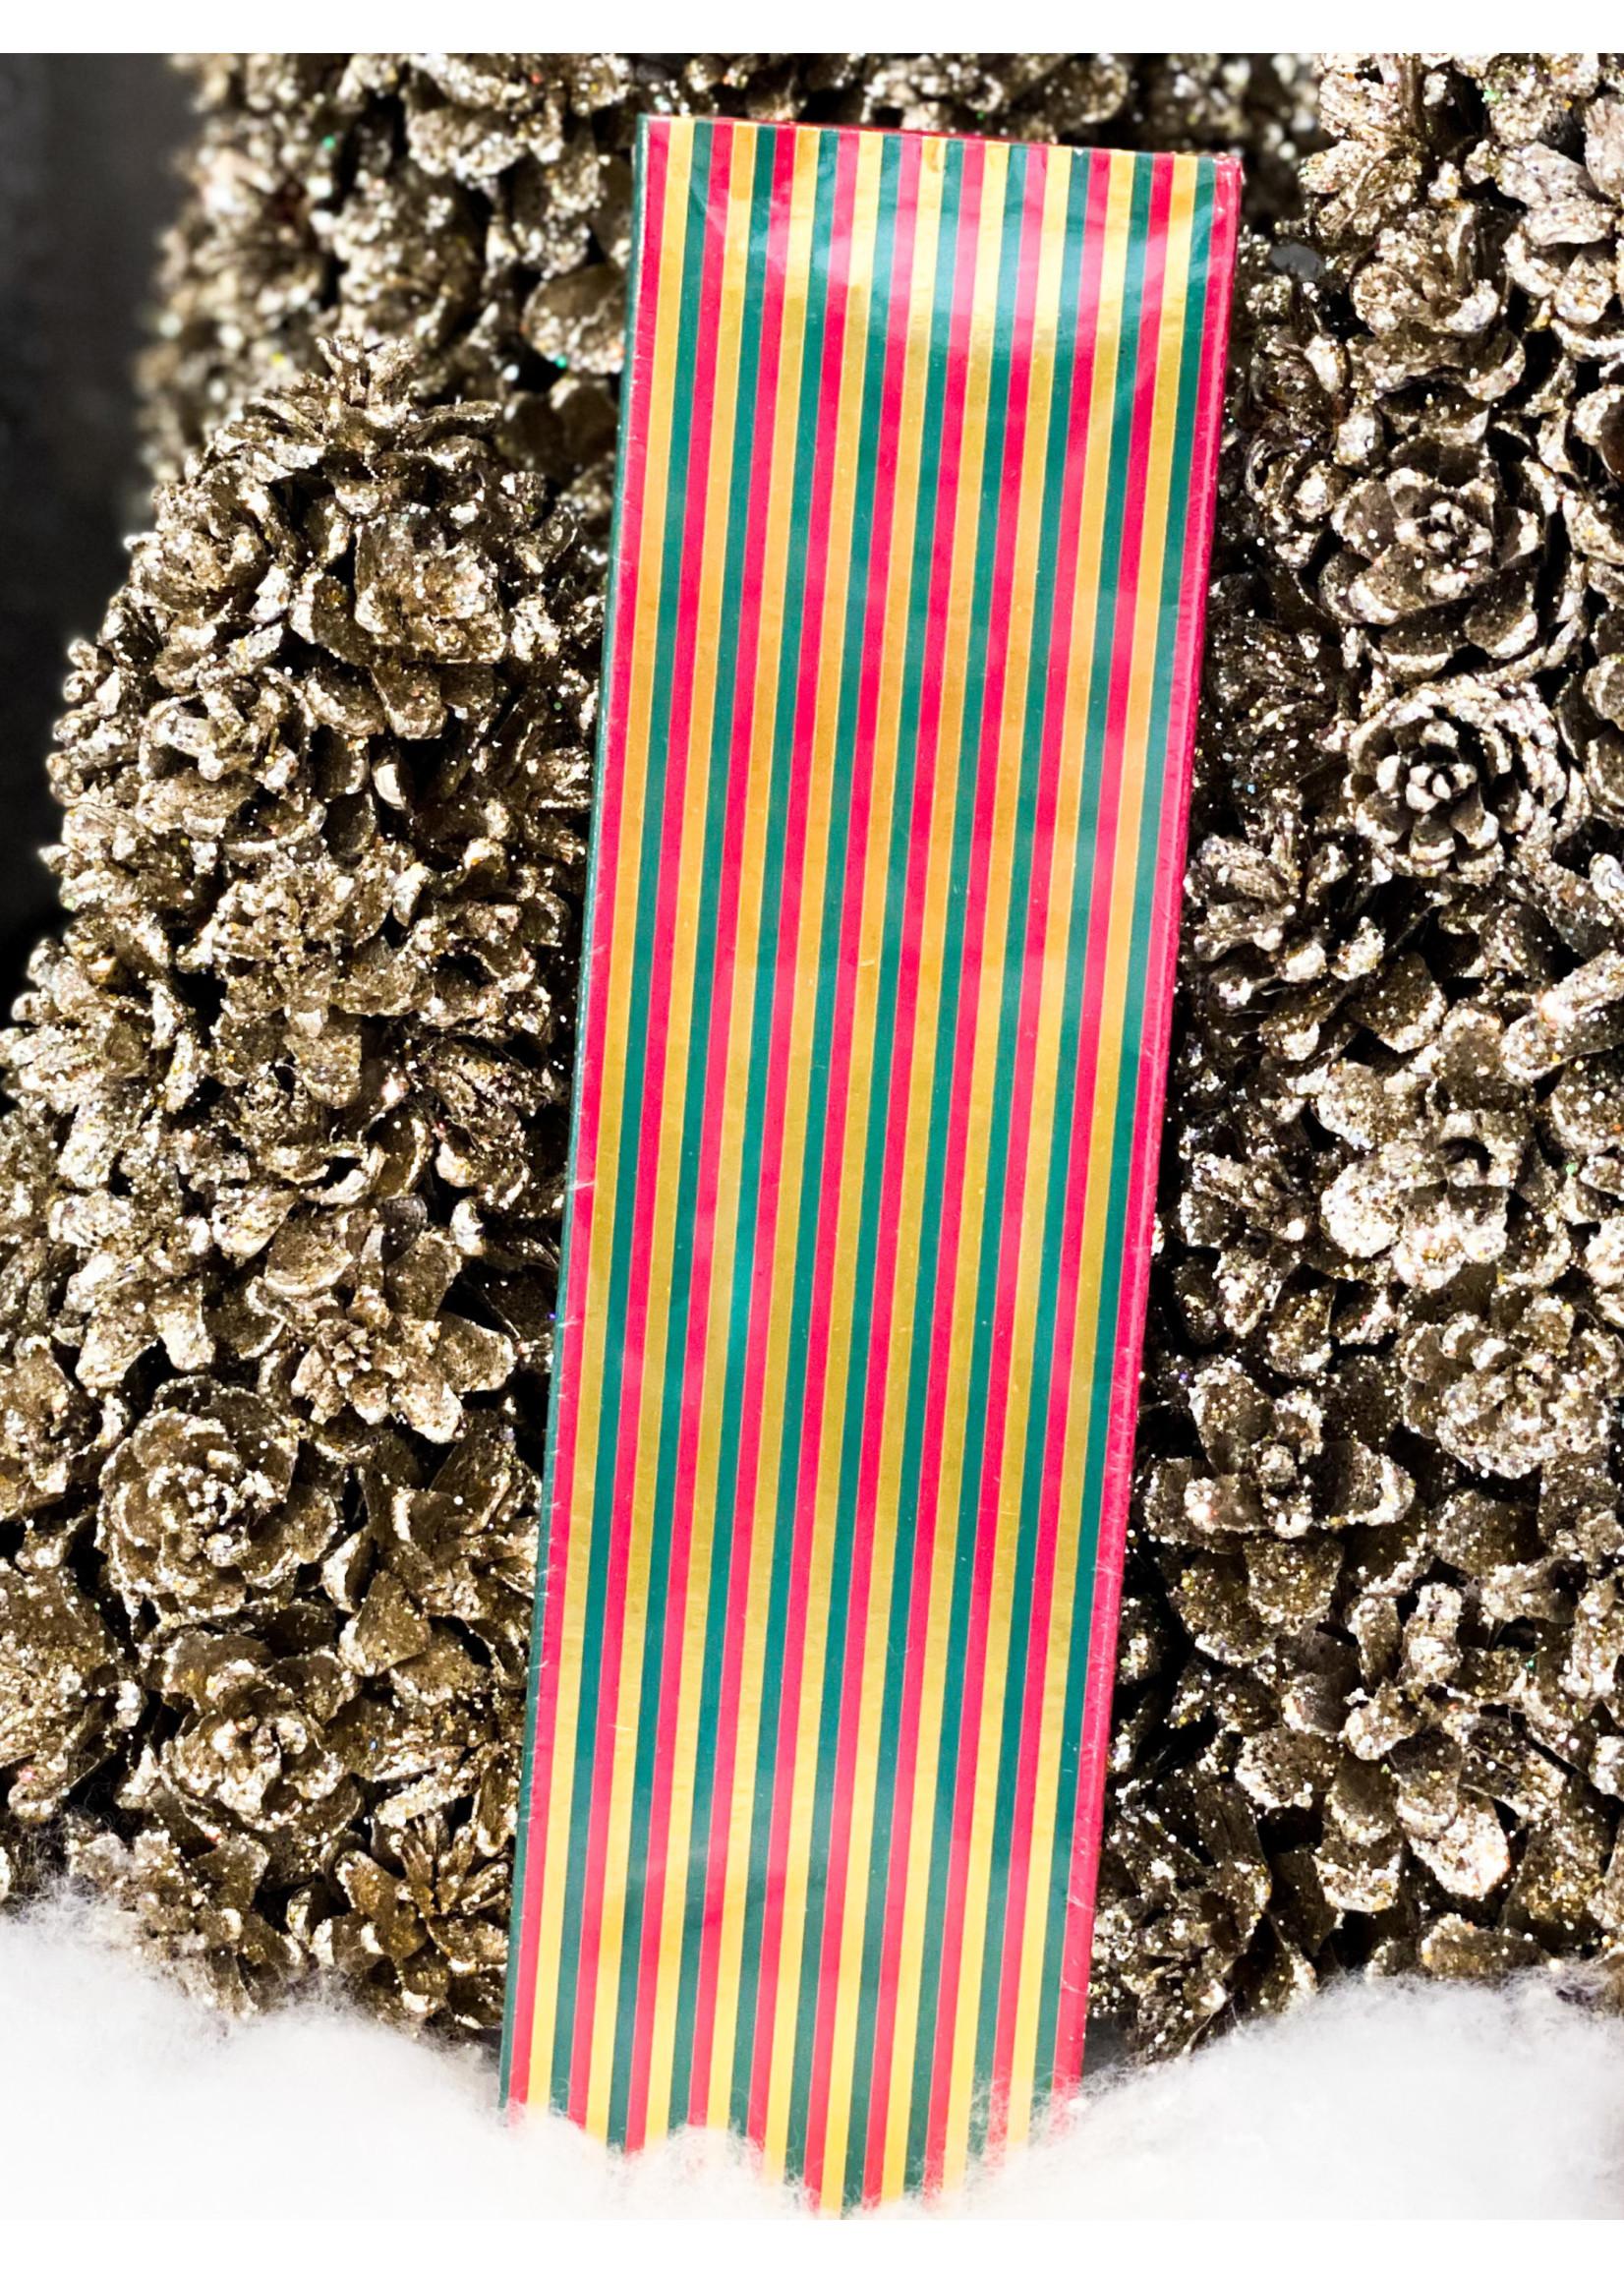 Matchbox - Fireplace Matches - Holiday Stripes